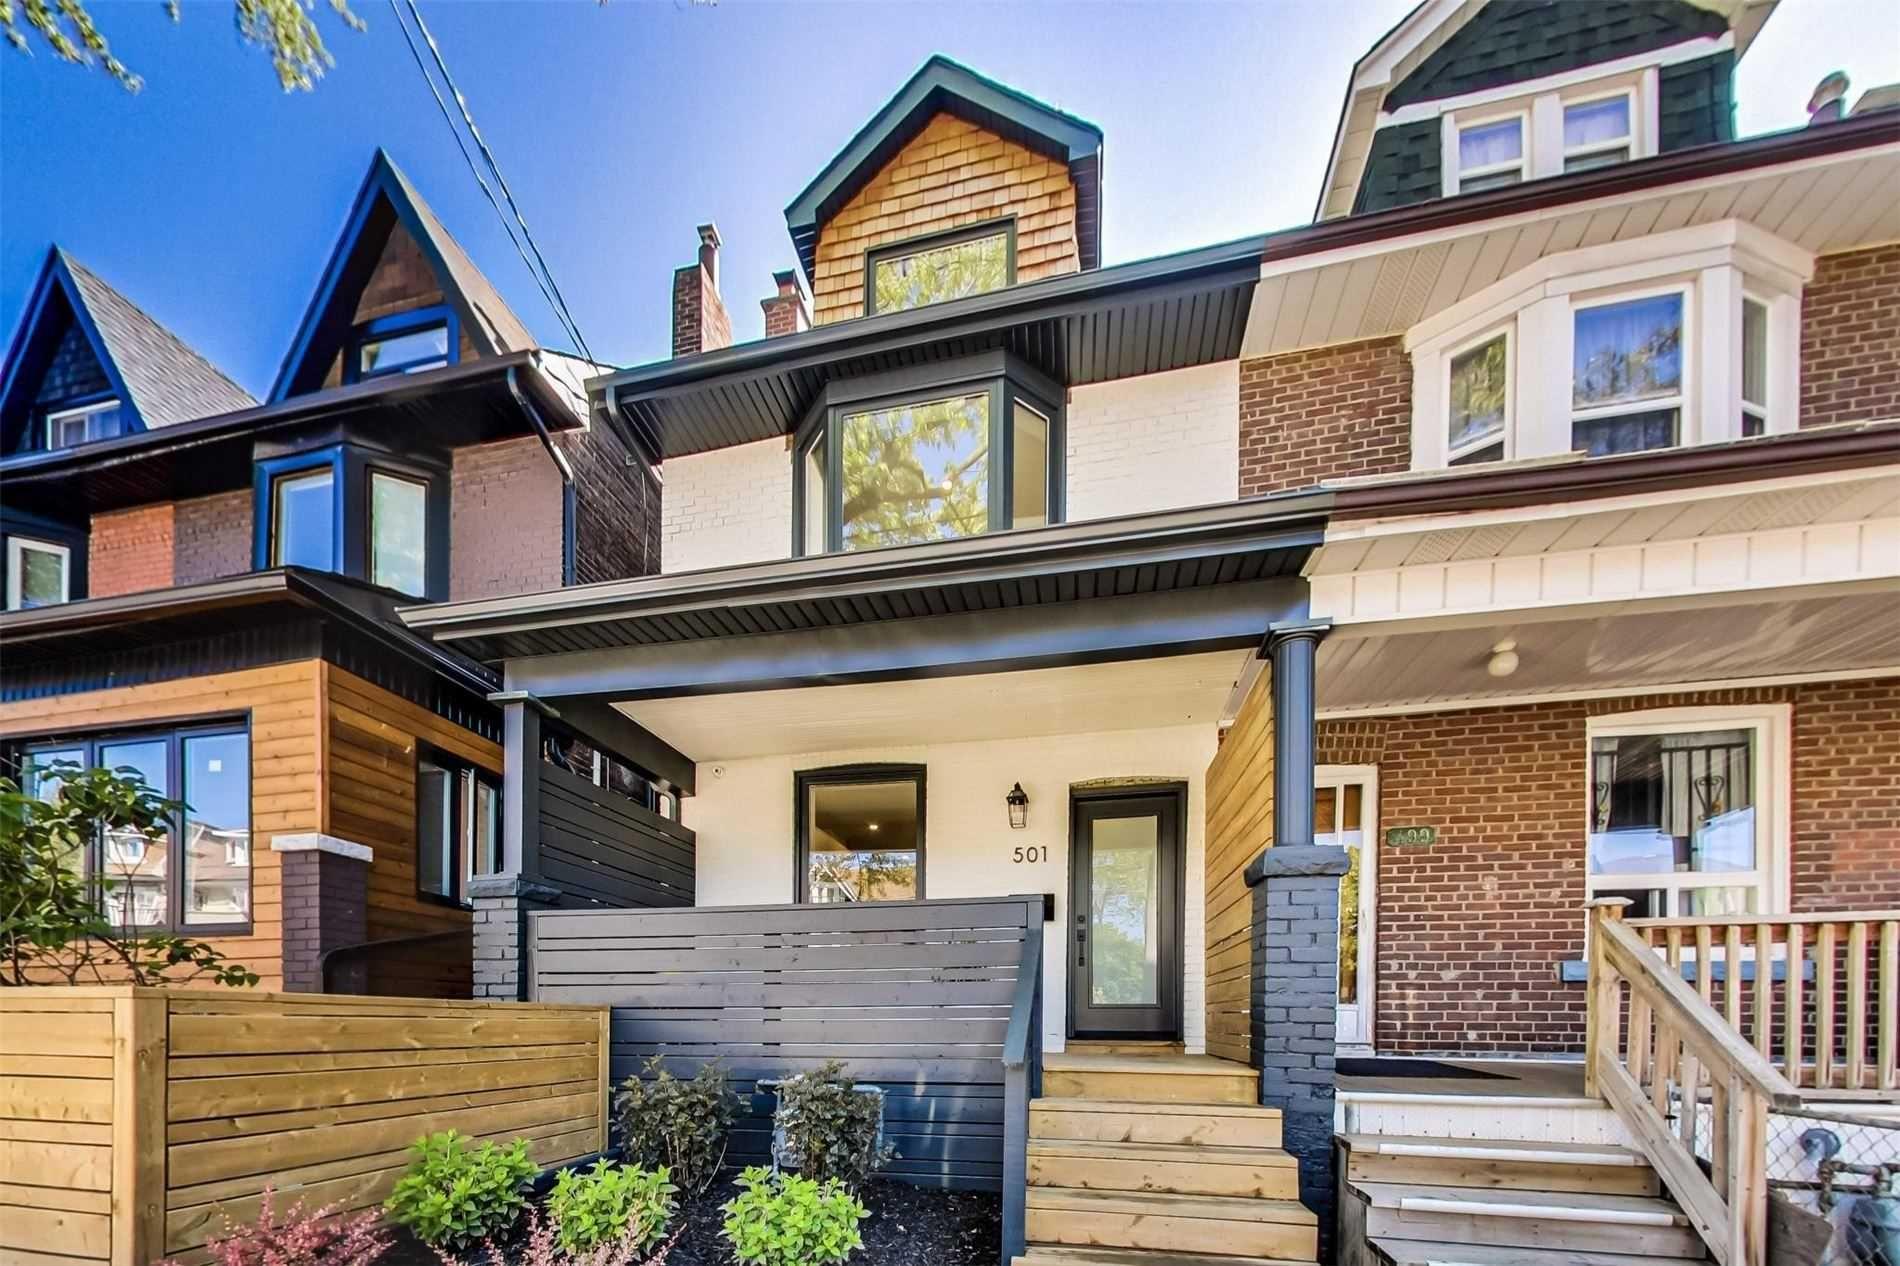 Main Photo: 501A Carlaw Avenue in Toronto: South Riverdale House (2 1/2 Storey) for lease (Toronto E01)  : MLS®# E4800675